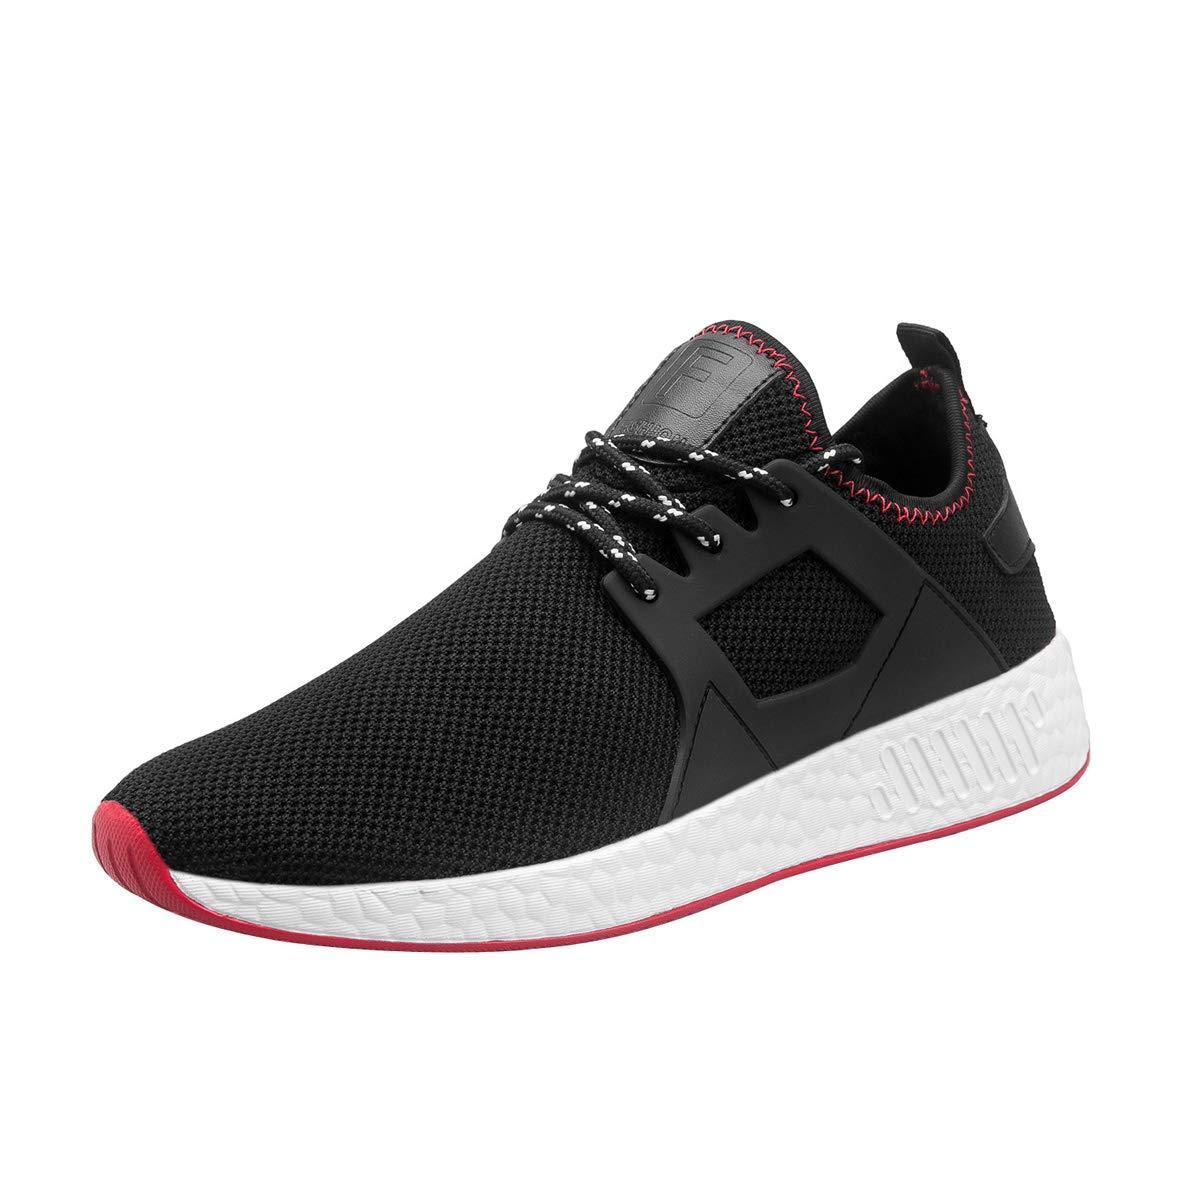 Mevoit Men's Running Shoes Fashion Breathable Sneakers Mesh Soft Sole Casual Athletic Lightweight Walking Footwear Mevoit1022/119